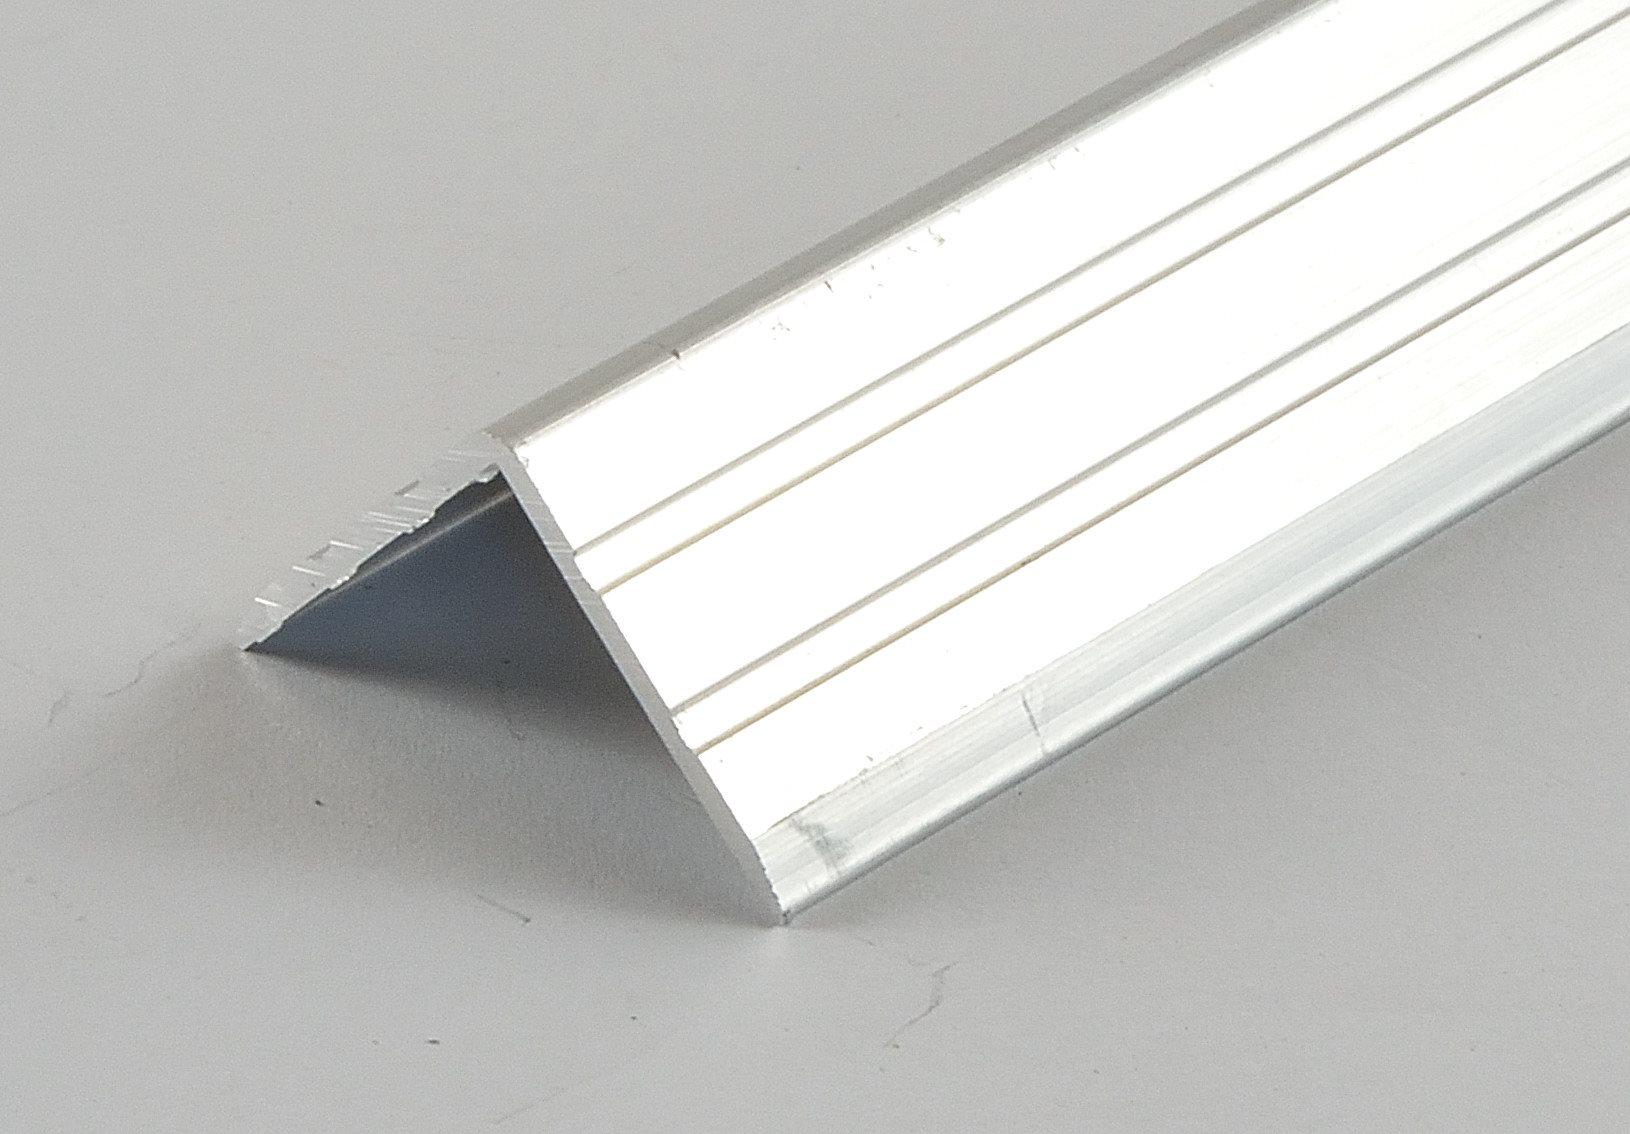 kantenschutz 22x22x1 5mm aluminium winkelprofil 10196. Black Bedroom Furniture Sets. Home Design Ideas